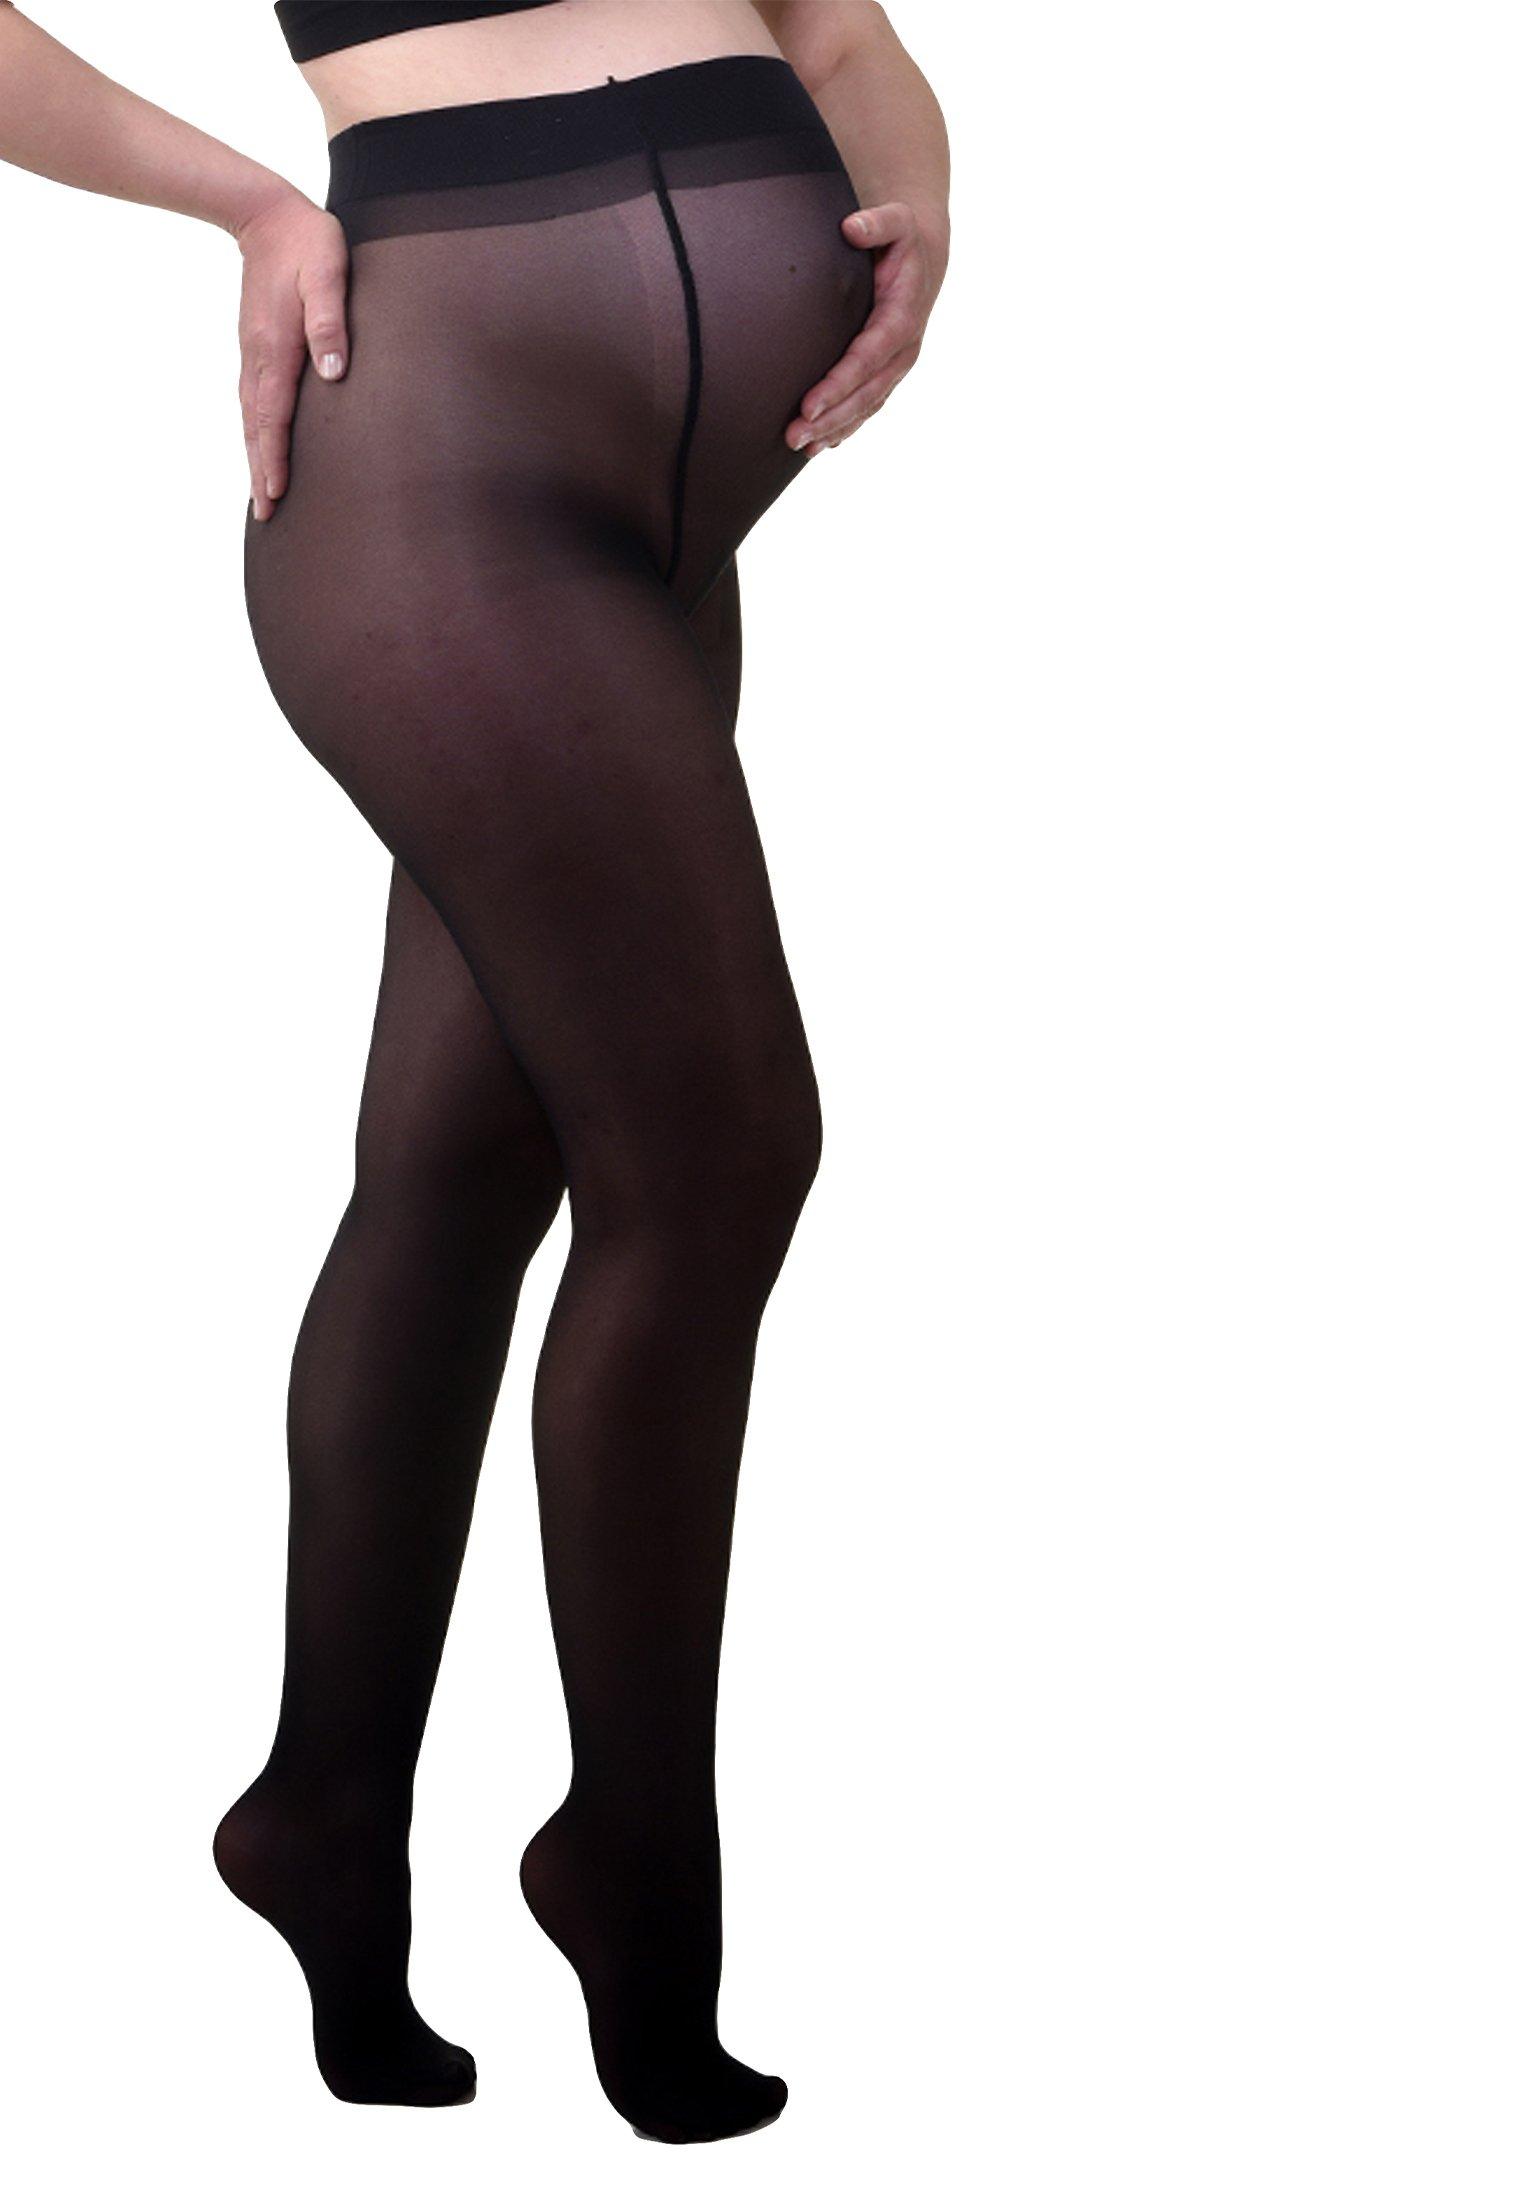 Femme SHEER 20DEN - Collants